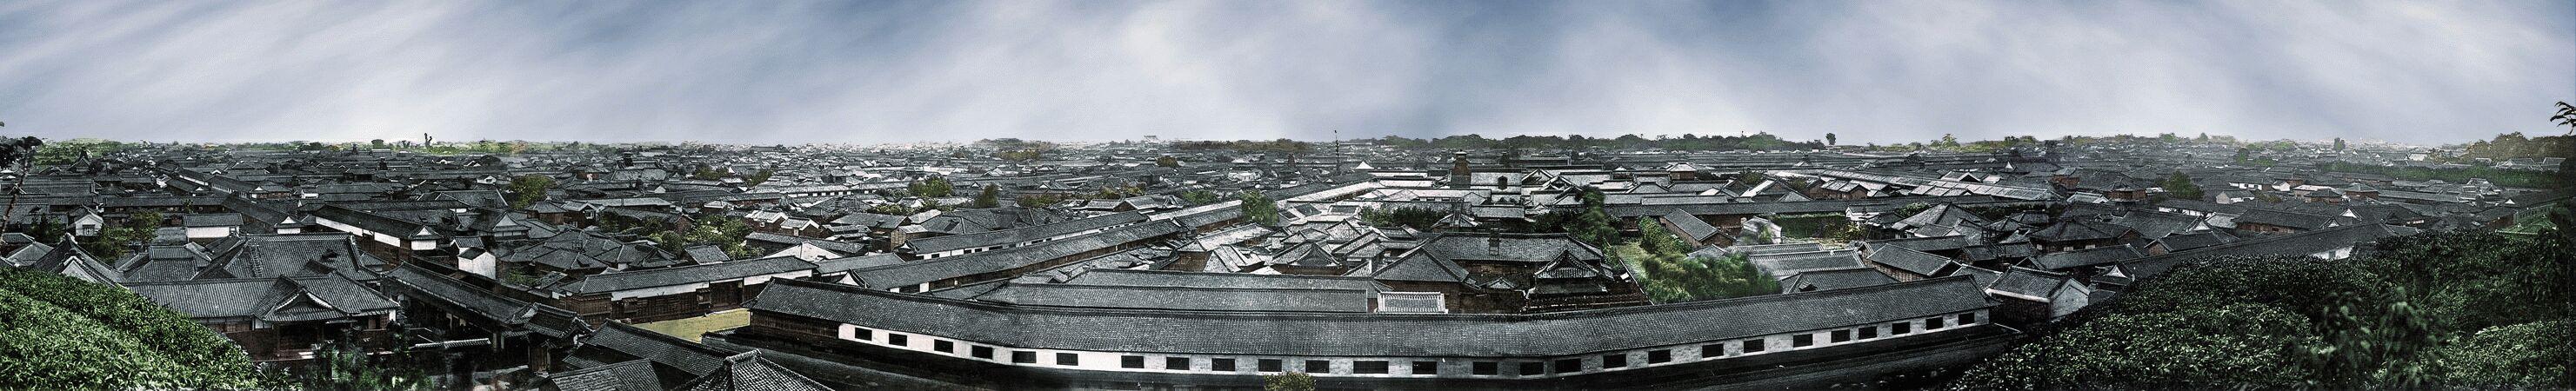 Panorama of Edo from Atagoyama by Felice Beato (1865 or 1866)